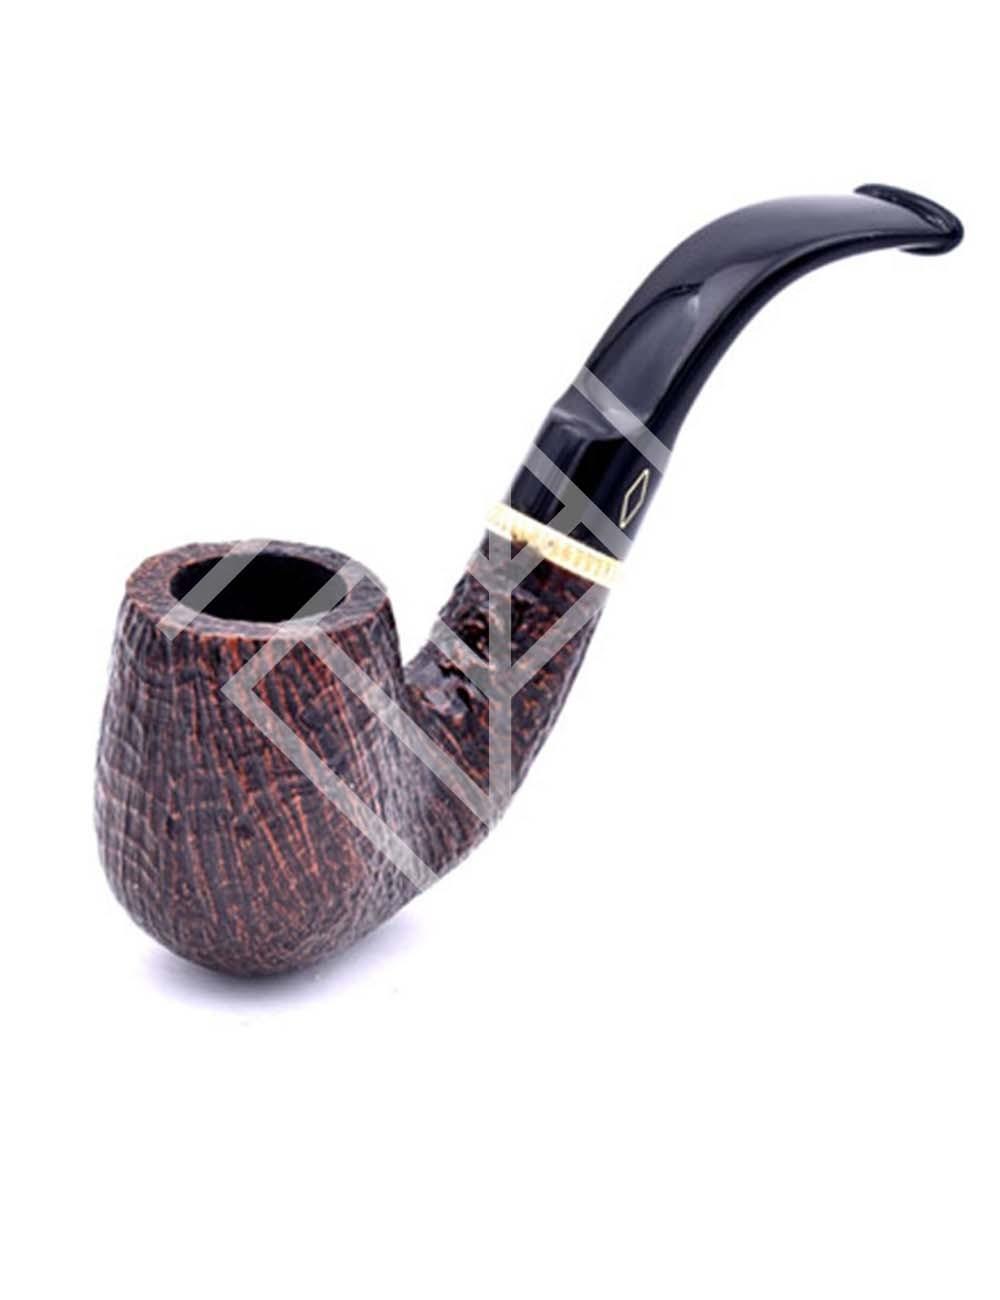 Pipa Brebbia FIRST SANDBLASTED 6007